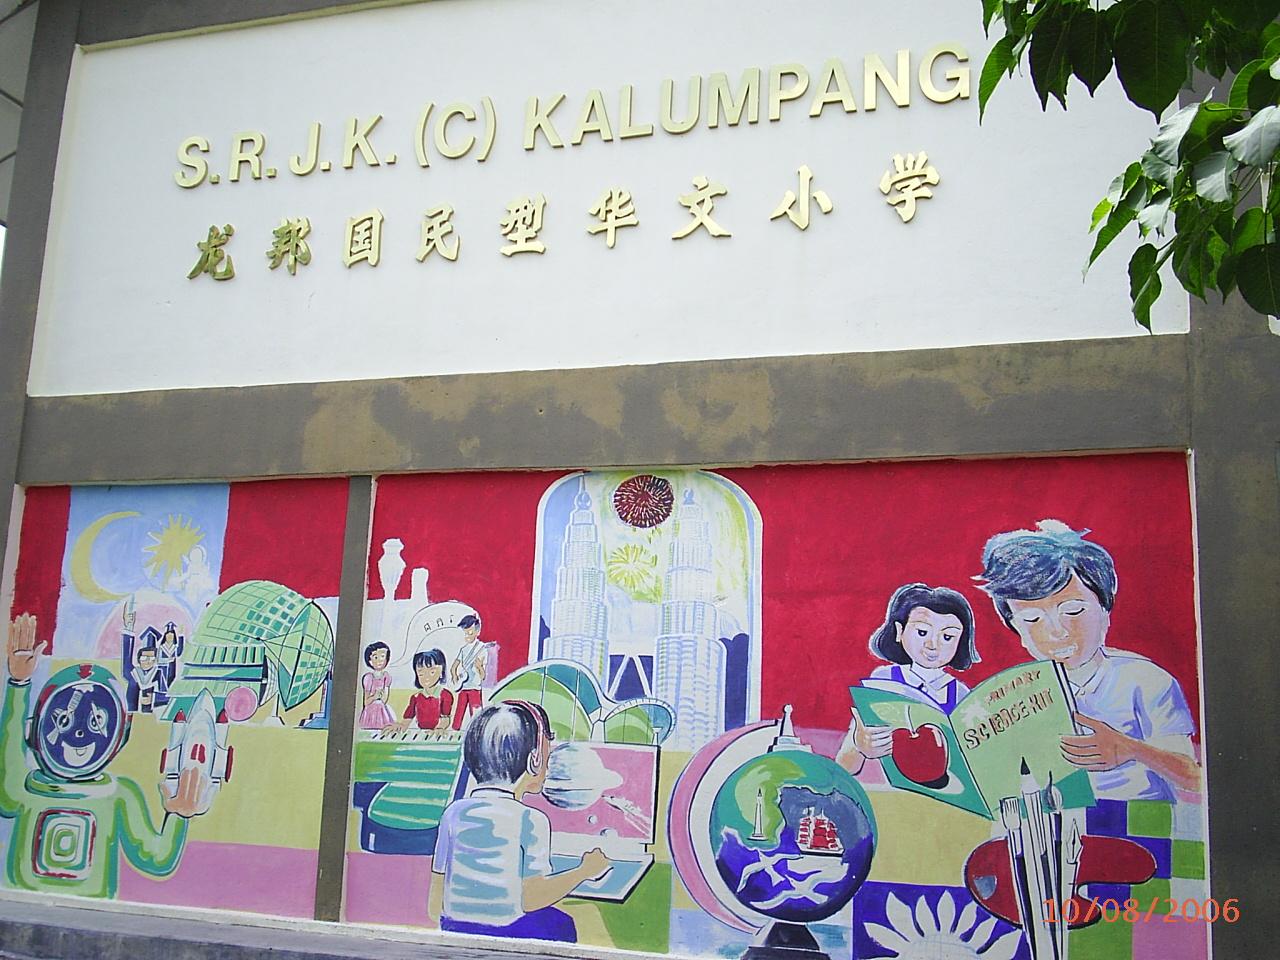 Sjk c kalumpang for Mural sekolah